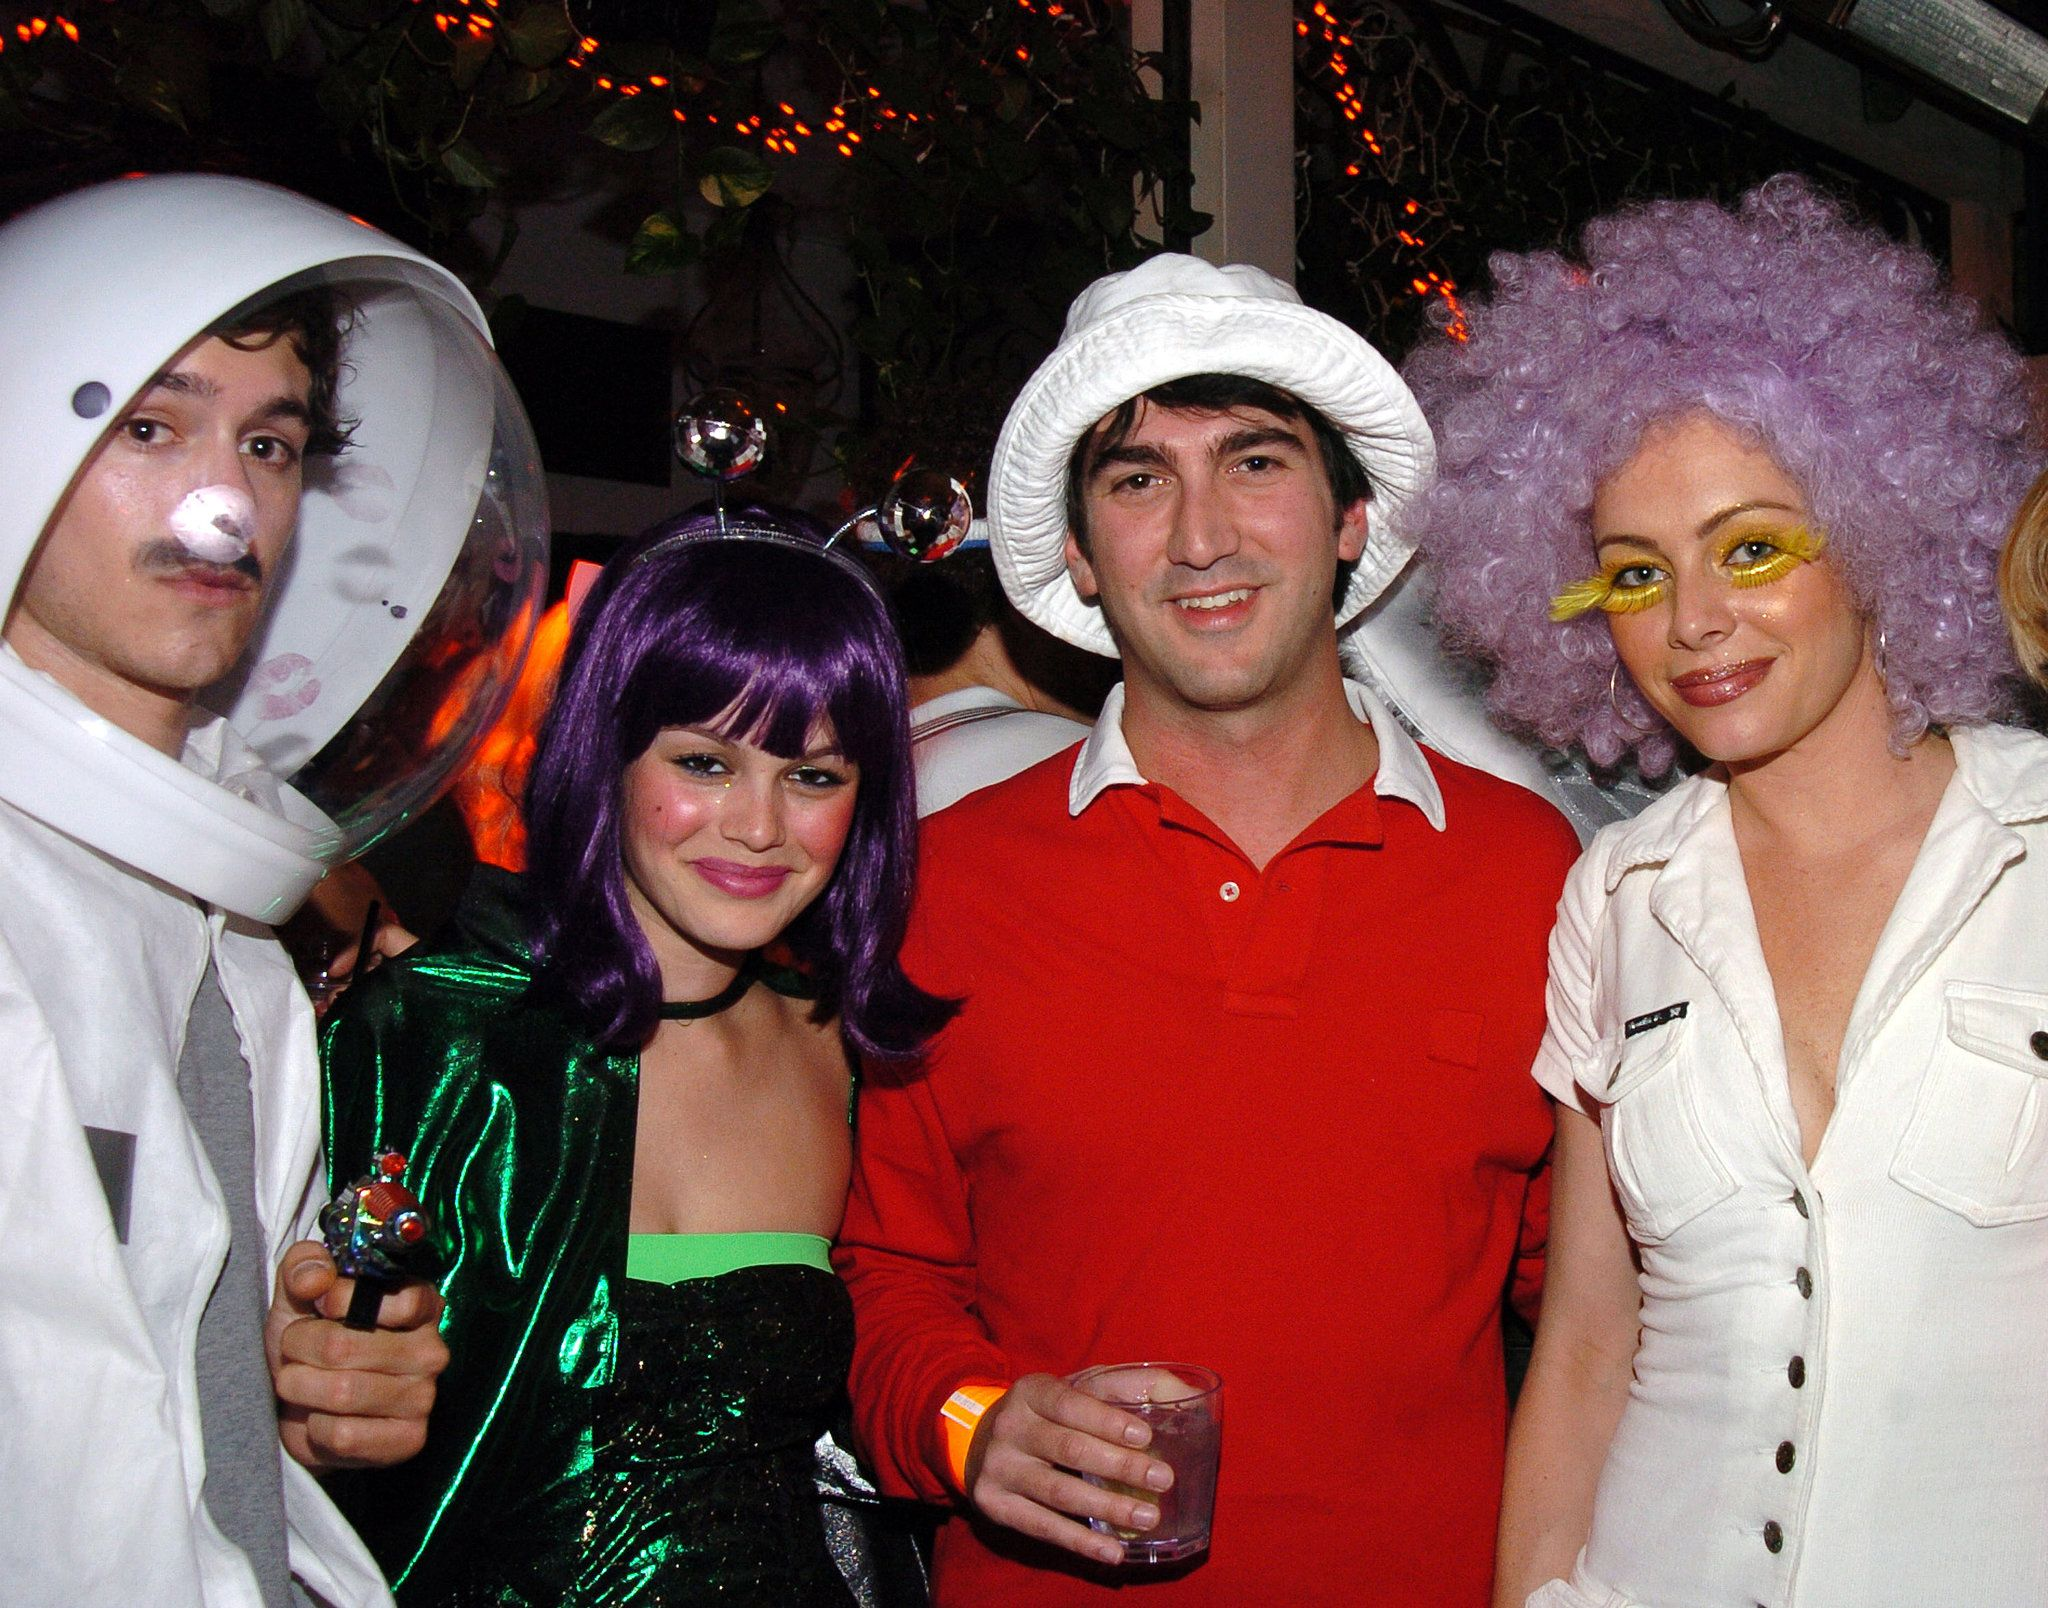 Over 250 Celebrity Halloween Costumes! | Adam brody, Celebrity ...